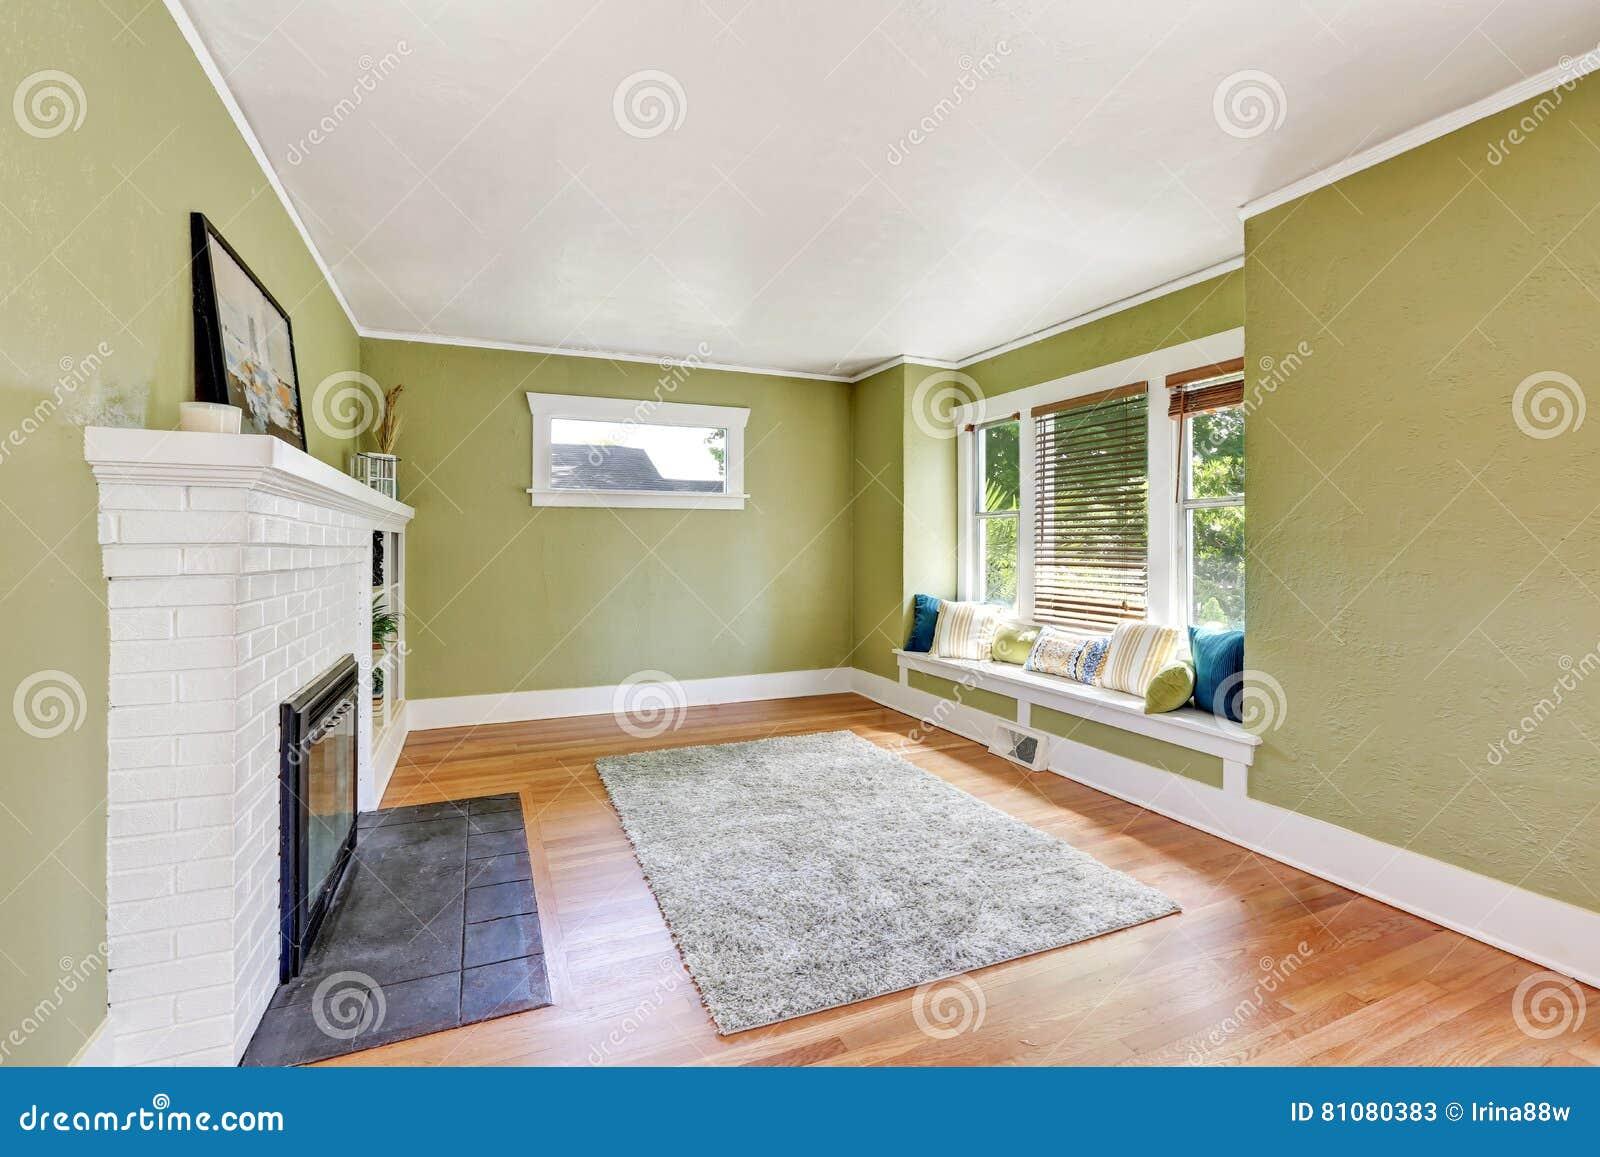 Living Room Interior Design Of Craftsman House Stock Photo